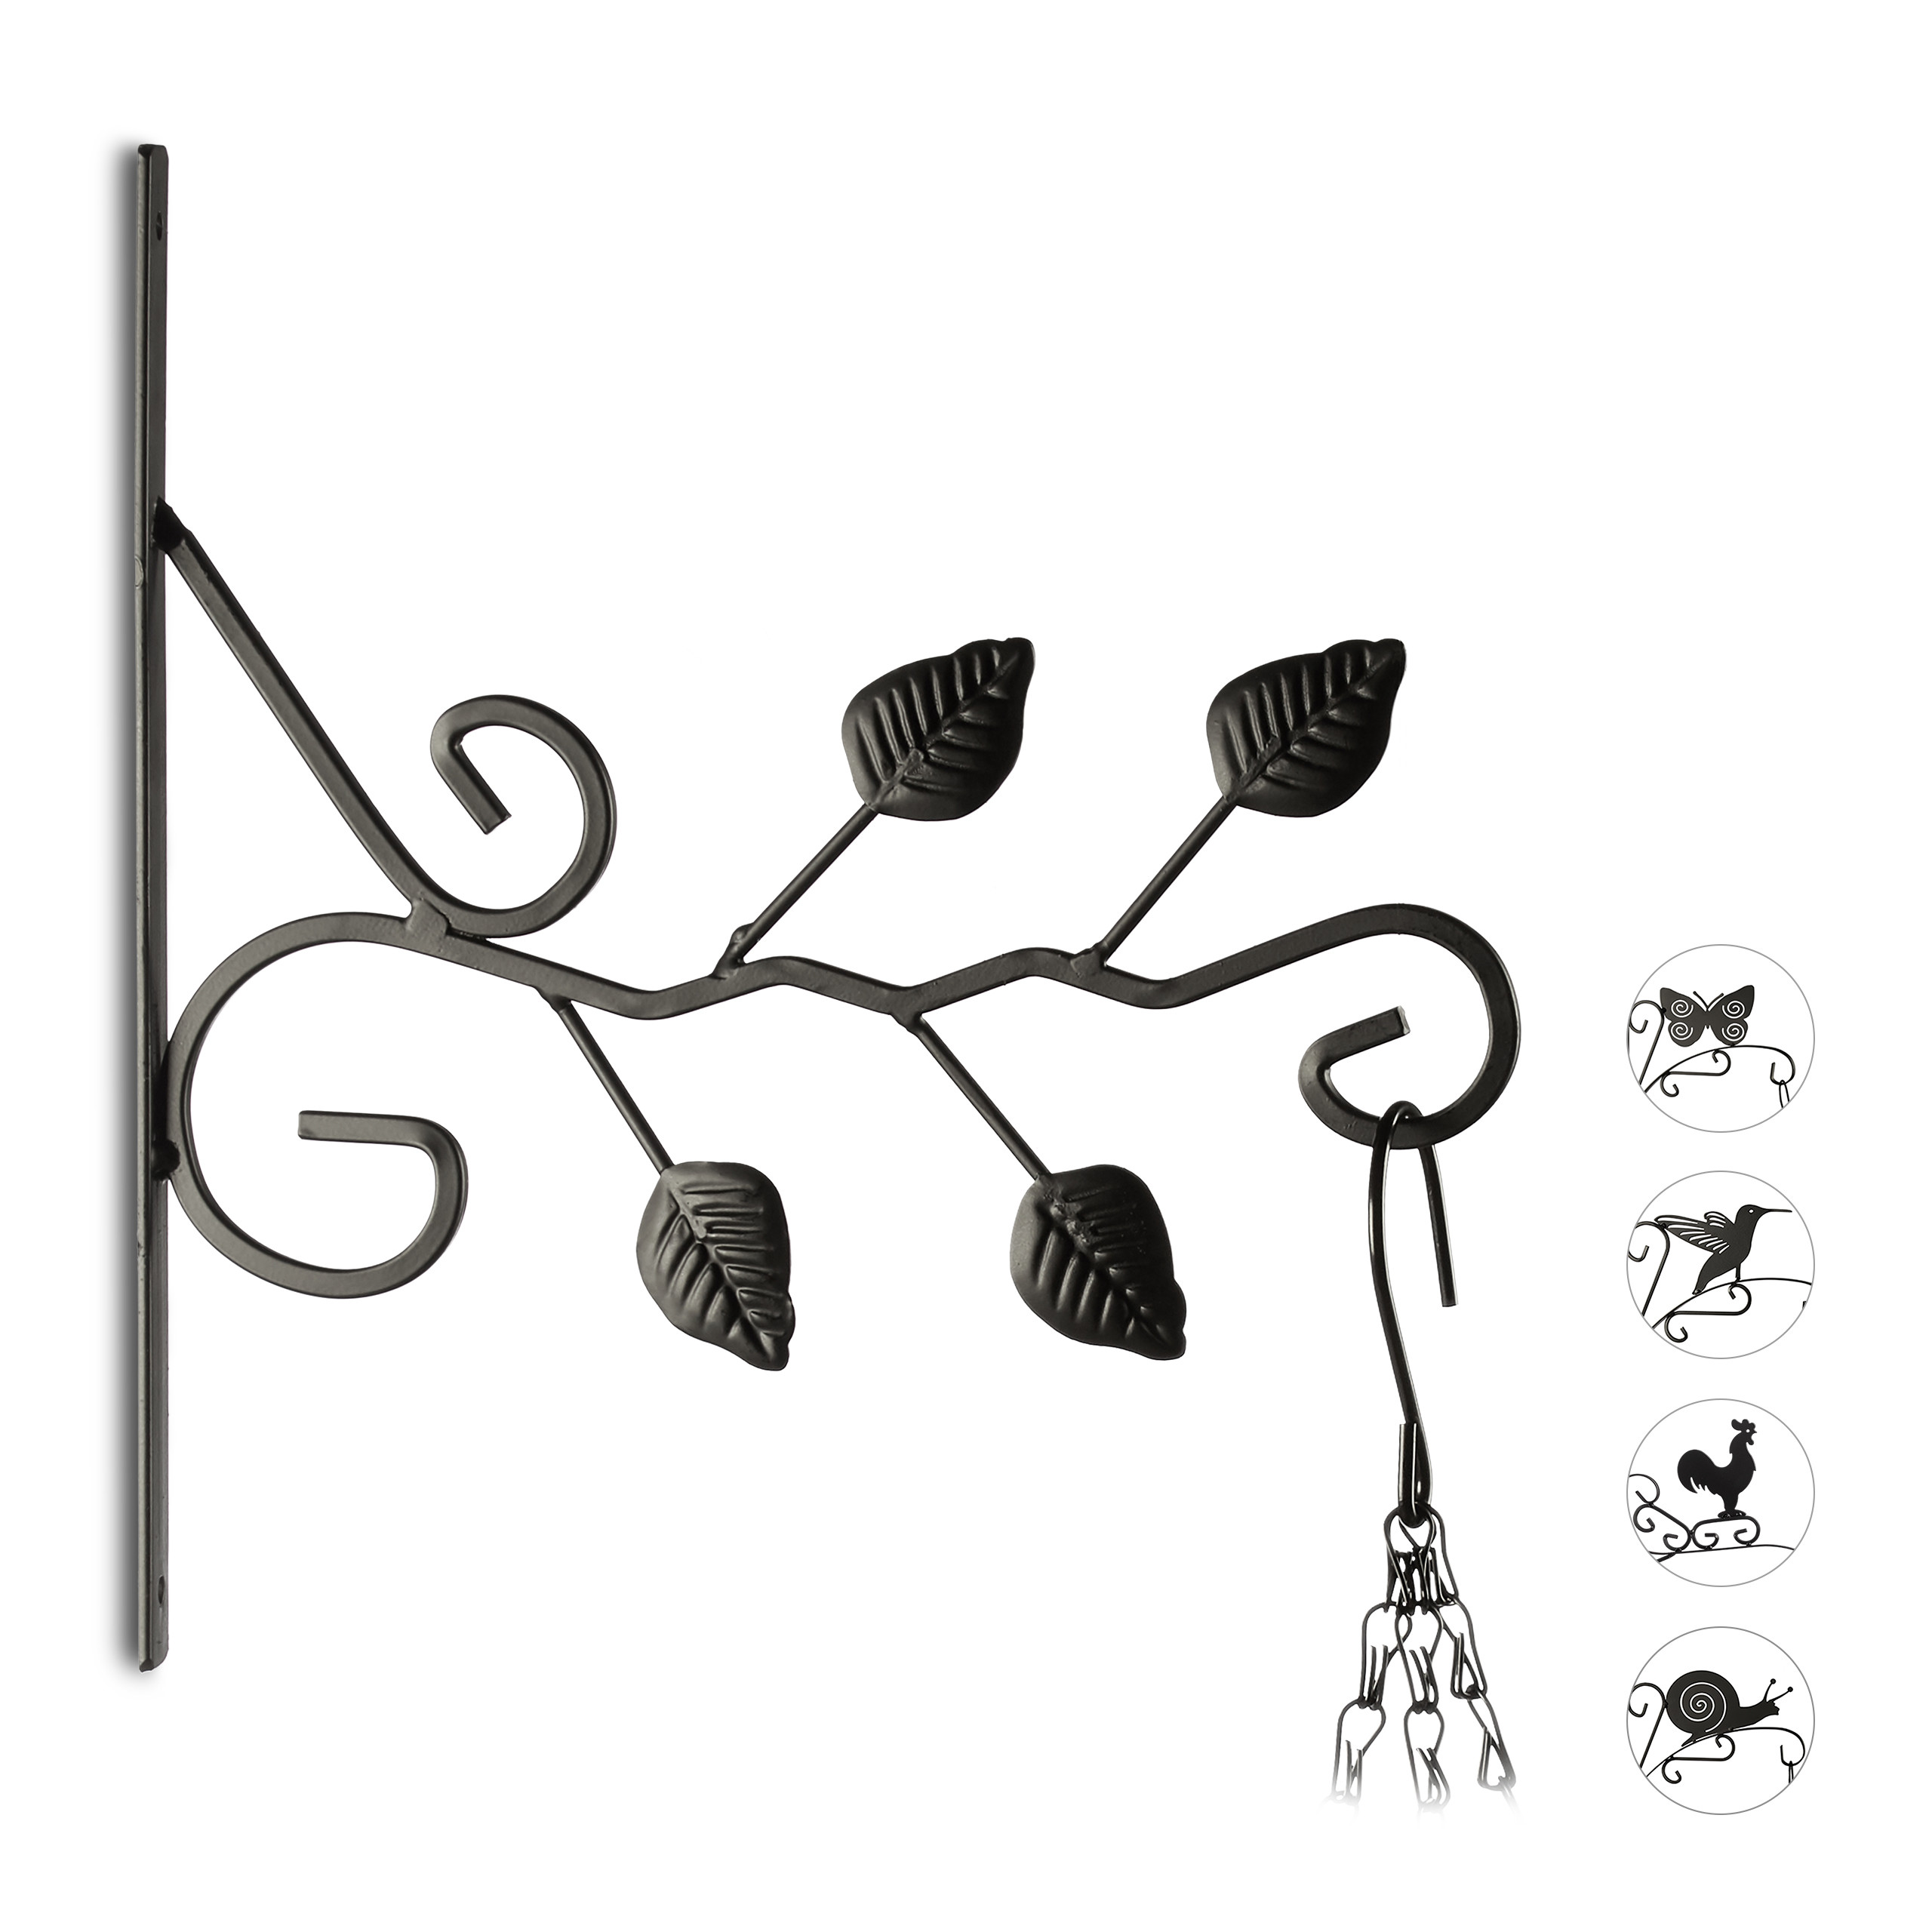 blumenhaken ampelhalter wand laterne vogel schmetterling schnecke bl tter deko ebay. Black Bedroom Furniture Sets. Home Design Ideas